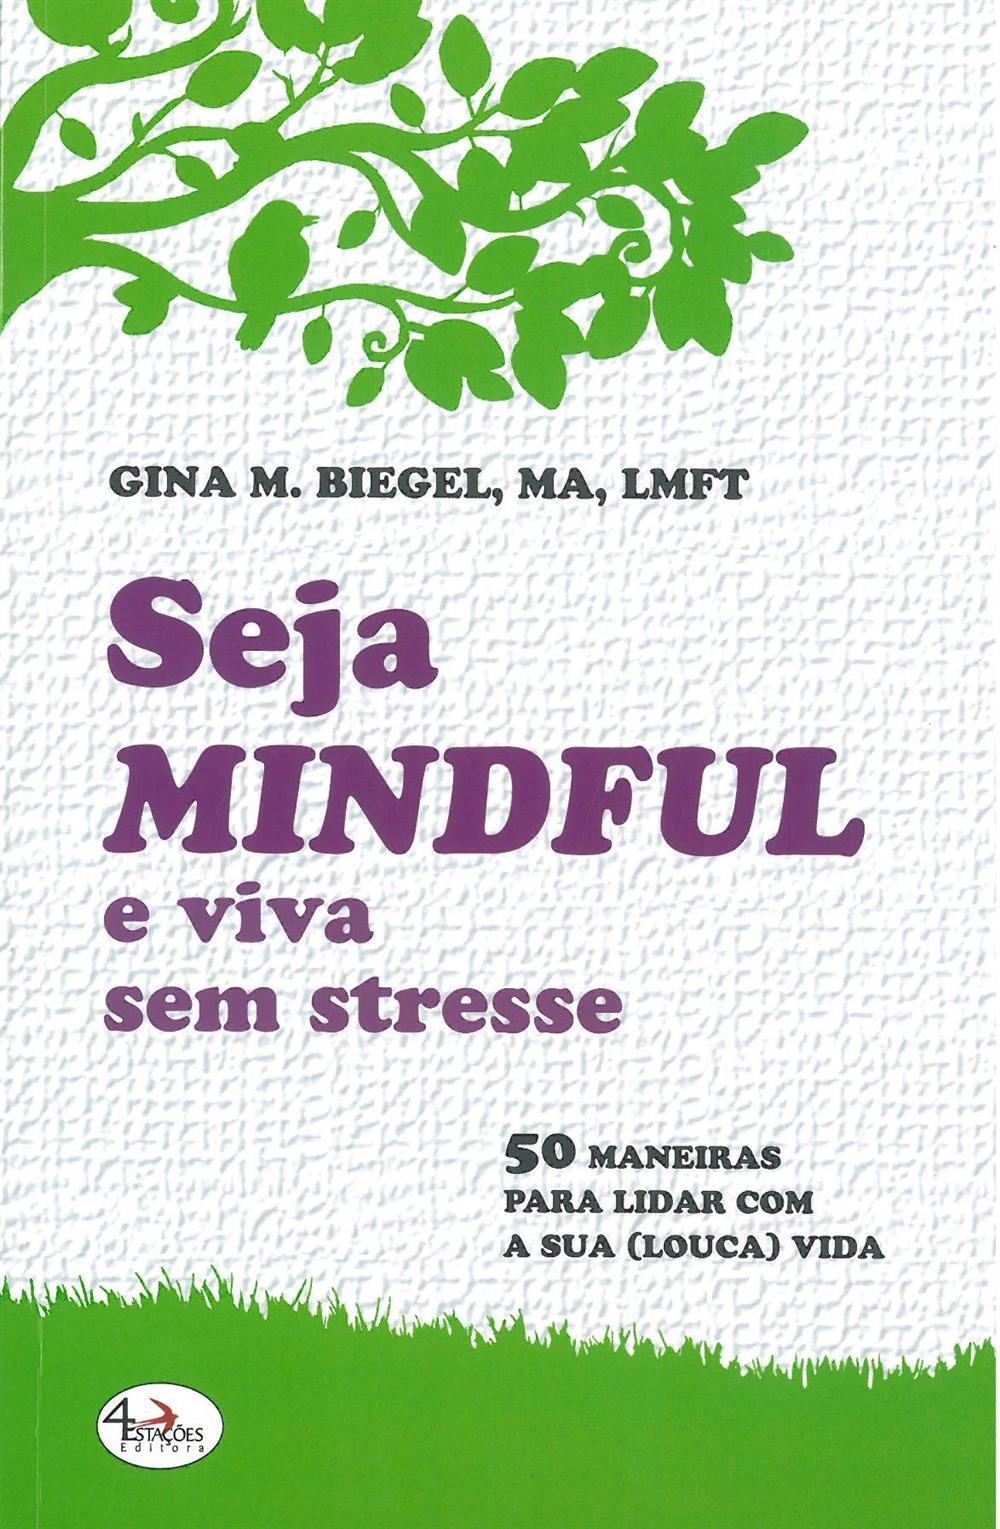 Seja mindful e viva sem stresse_.jpg